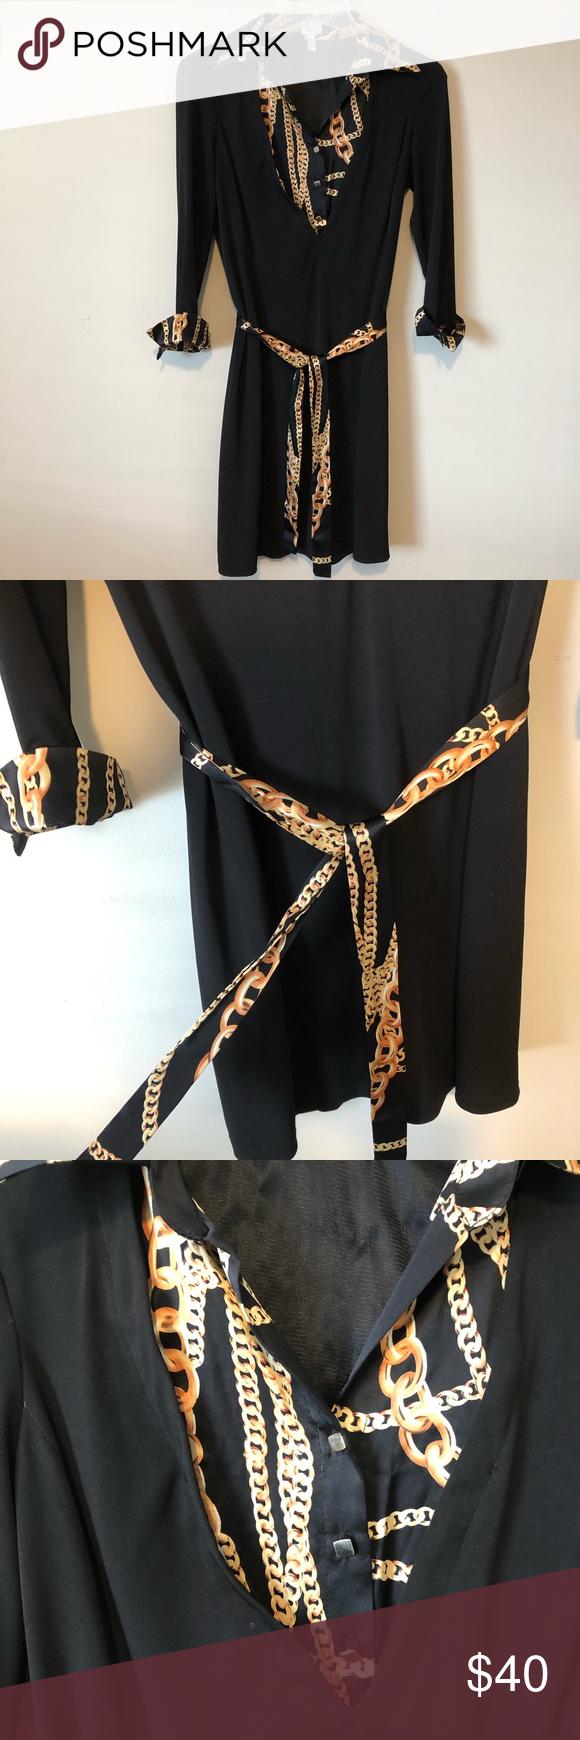 Gold Body Chain Over Black Mini Dress Mini Black Dress Body Chain Rave Outfits [ 1450 x 960 Pixel ]